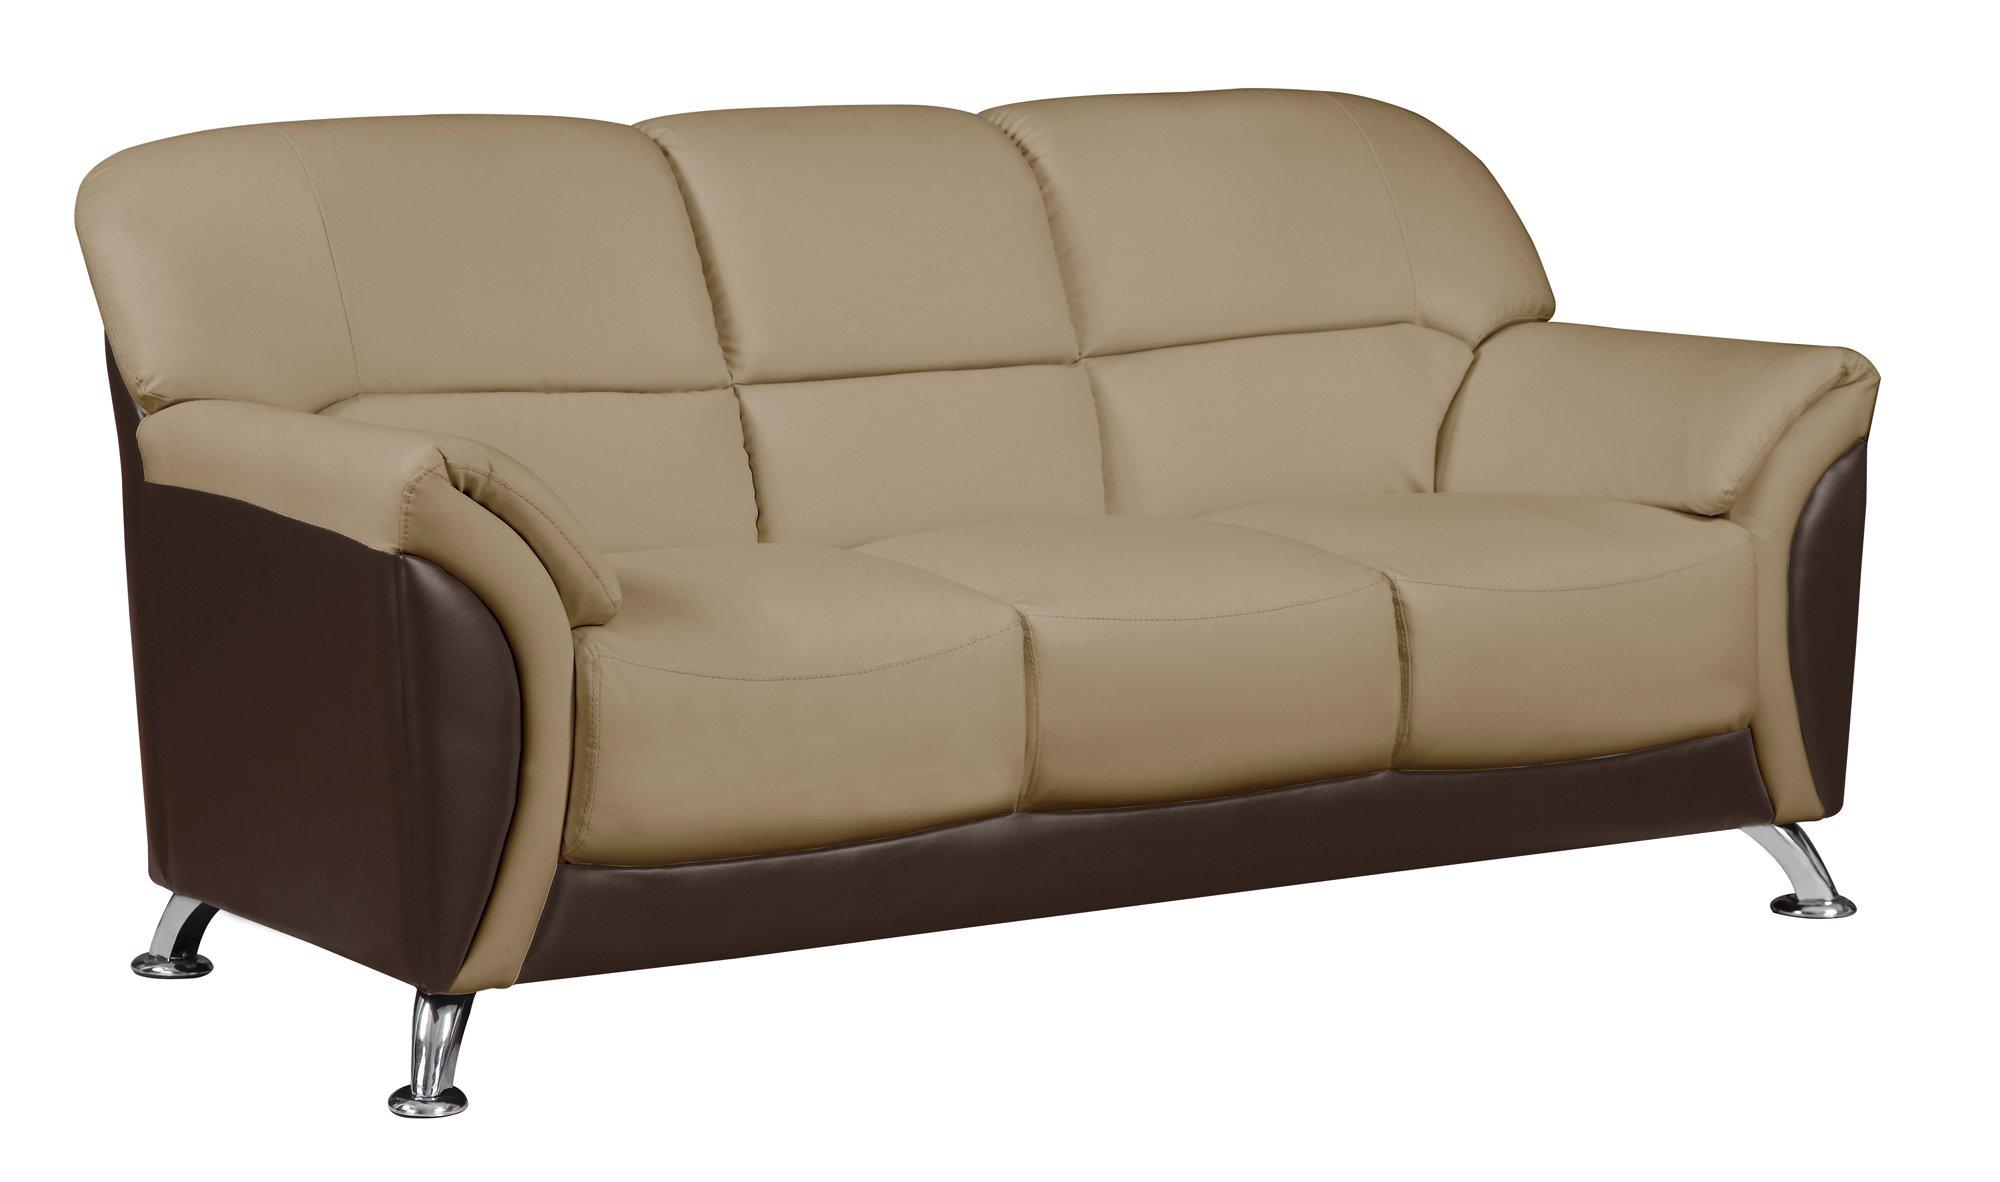 u9103 cappuccino chocolate vinyl sofa by global furniture. Black Bedroom Furniture Sets. Home Design Ideas